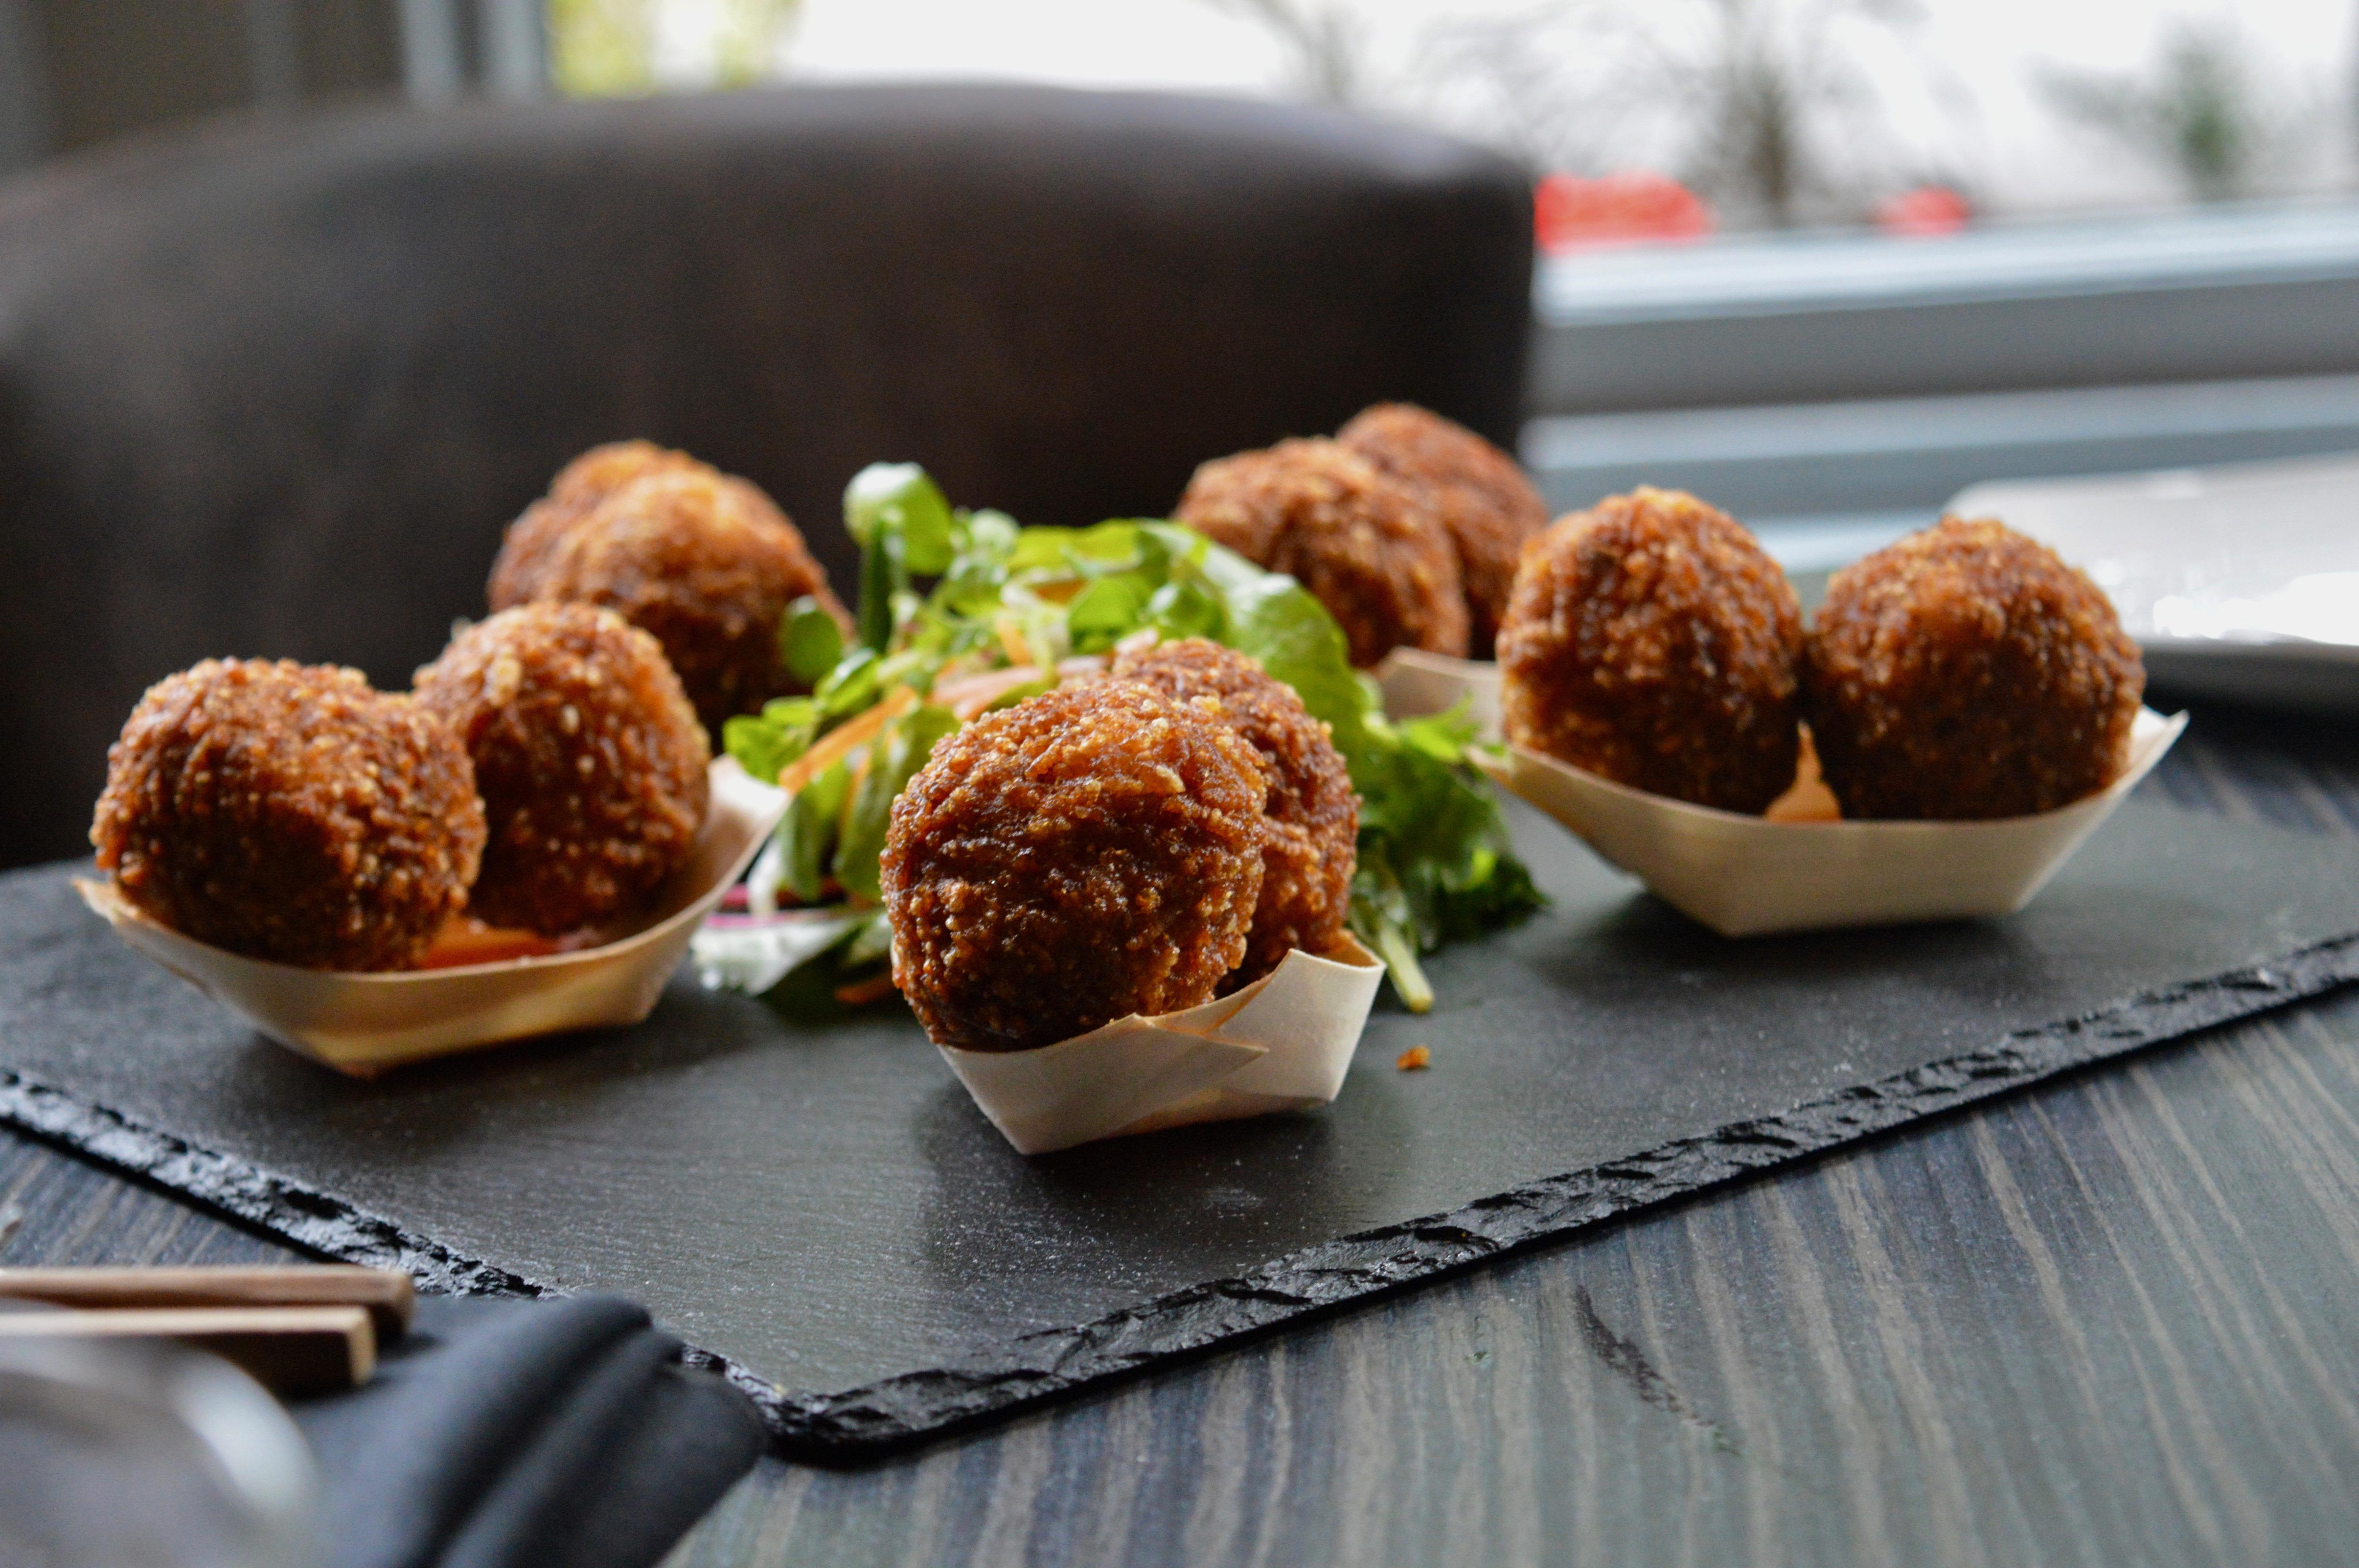 Aranchini-SoHe-Cocktail-Bar-Asian-Restaurant-Jesmond-Newcastle-Elle-Blonde-Luxury-Lifestyle-Blog